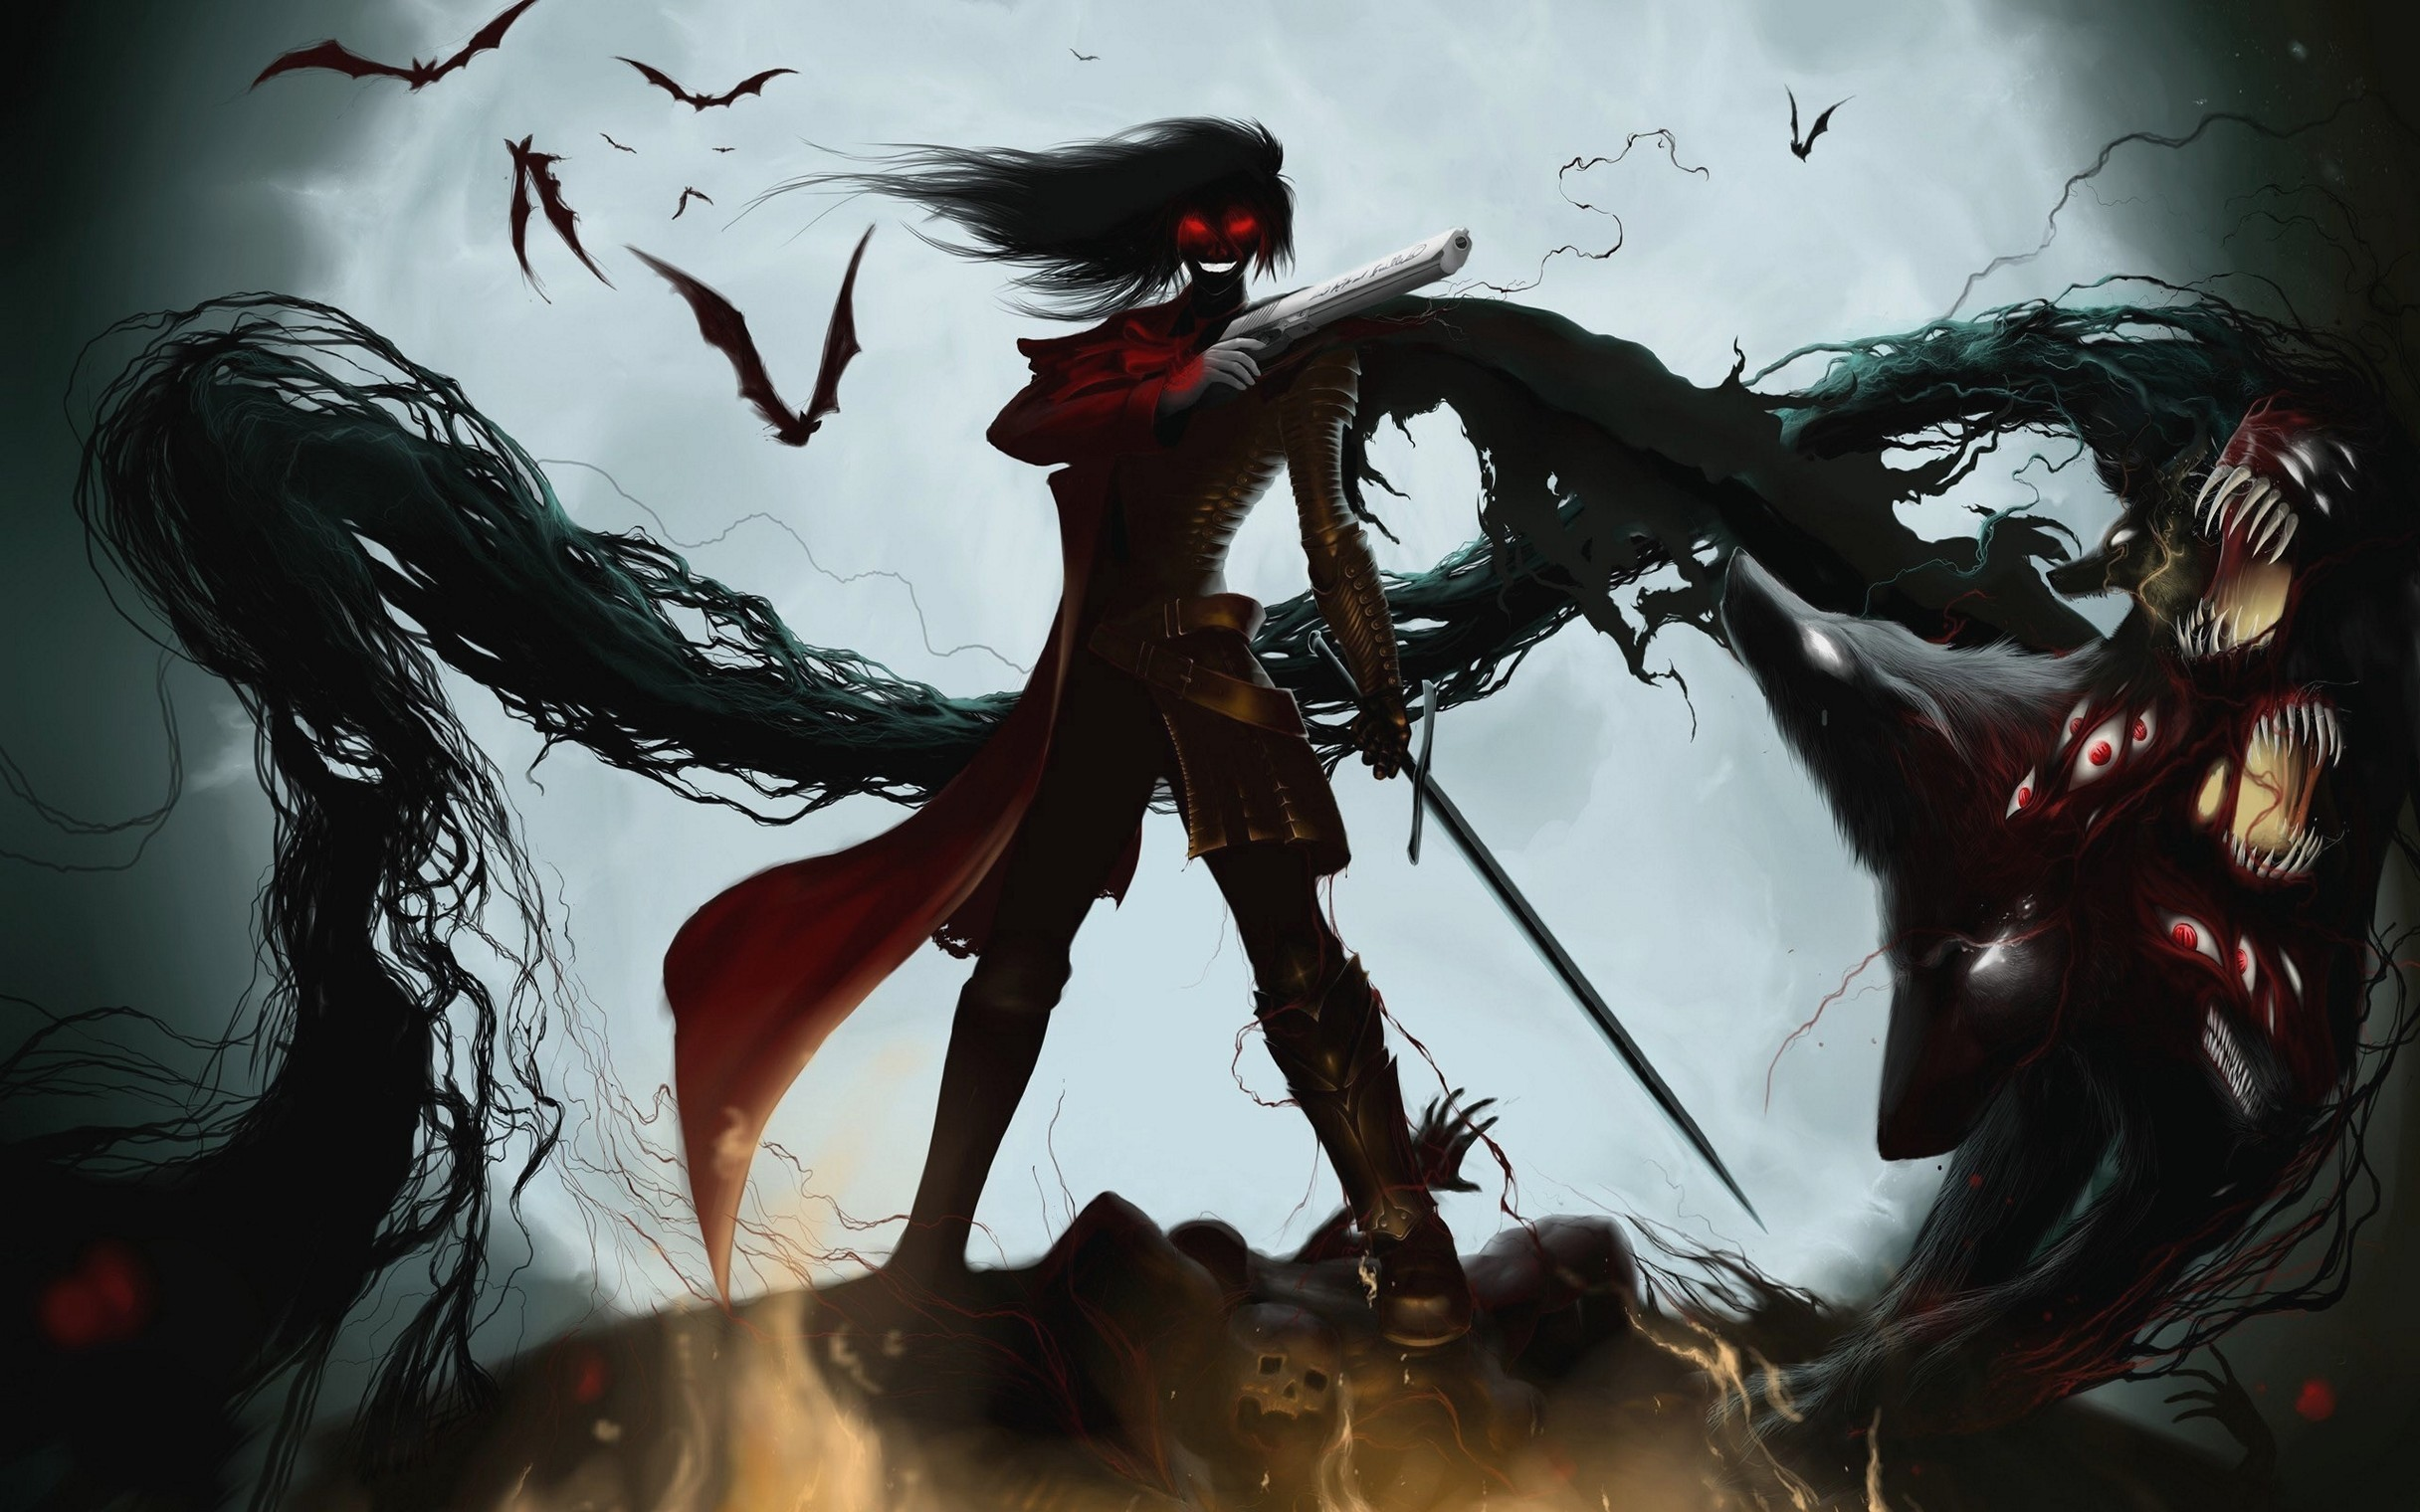 Hellsing Ultimate Alucard Vampire Anime Cute Wallpaper TEv444